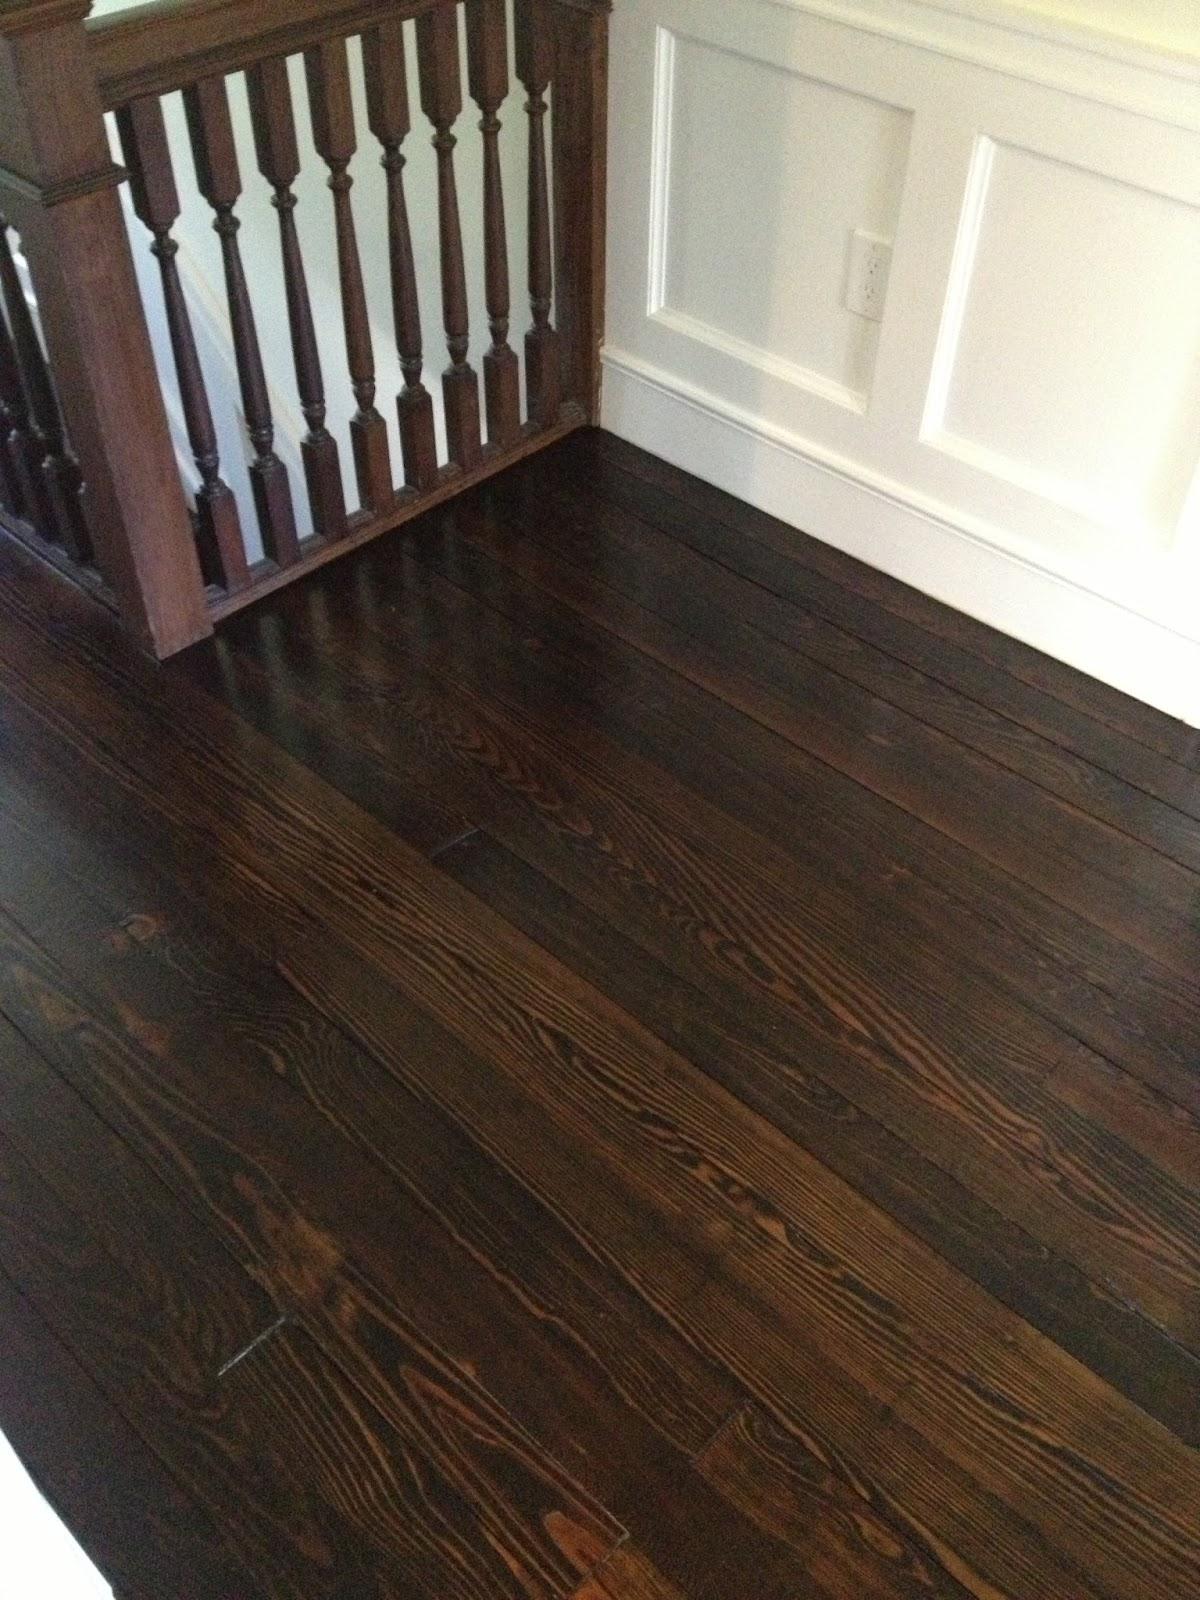 High street market 3rd floor refinished hardwood floor diy for Hardwood floors jacobean